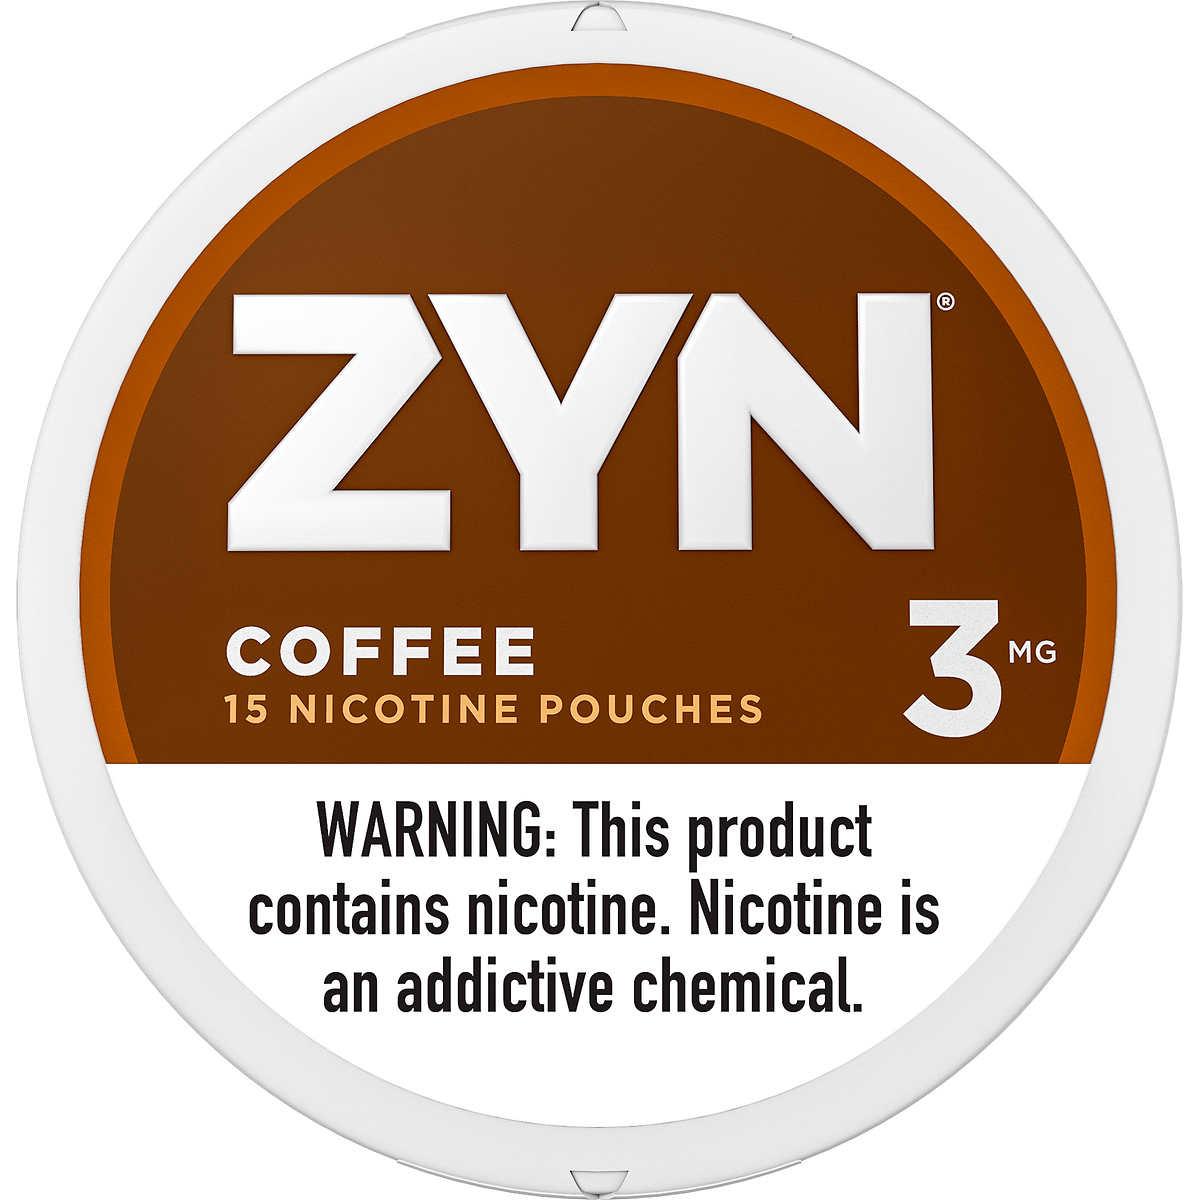 Zyn Snus Pouches, Coffee 03 mg, 15 Pouches, 5 ct